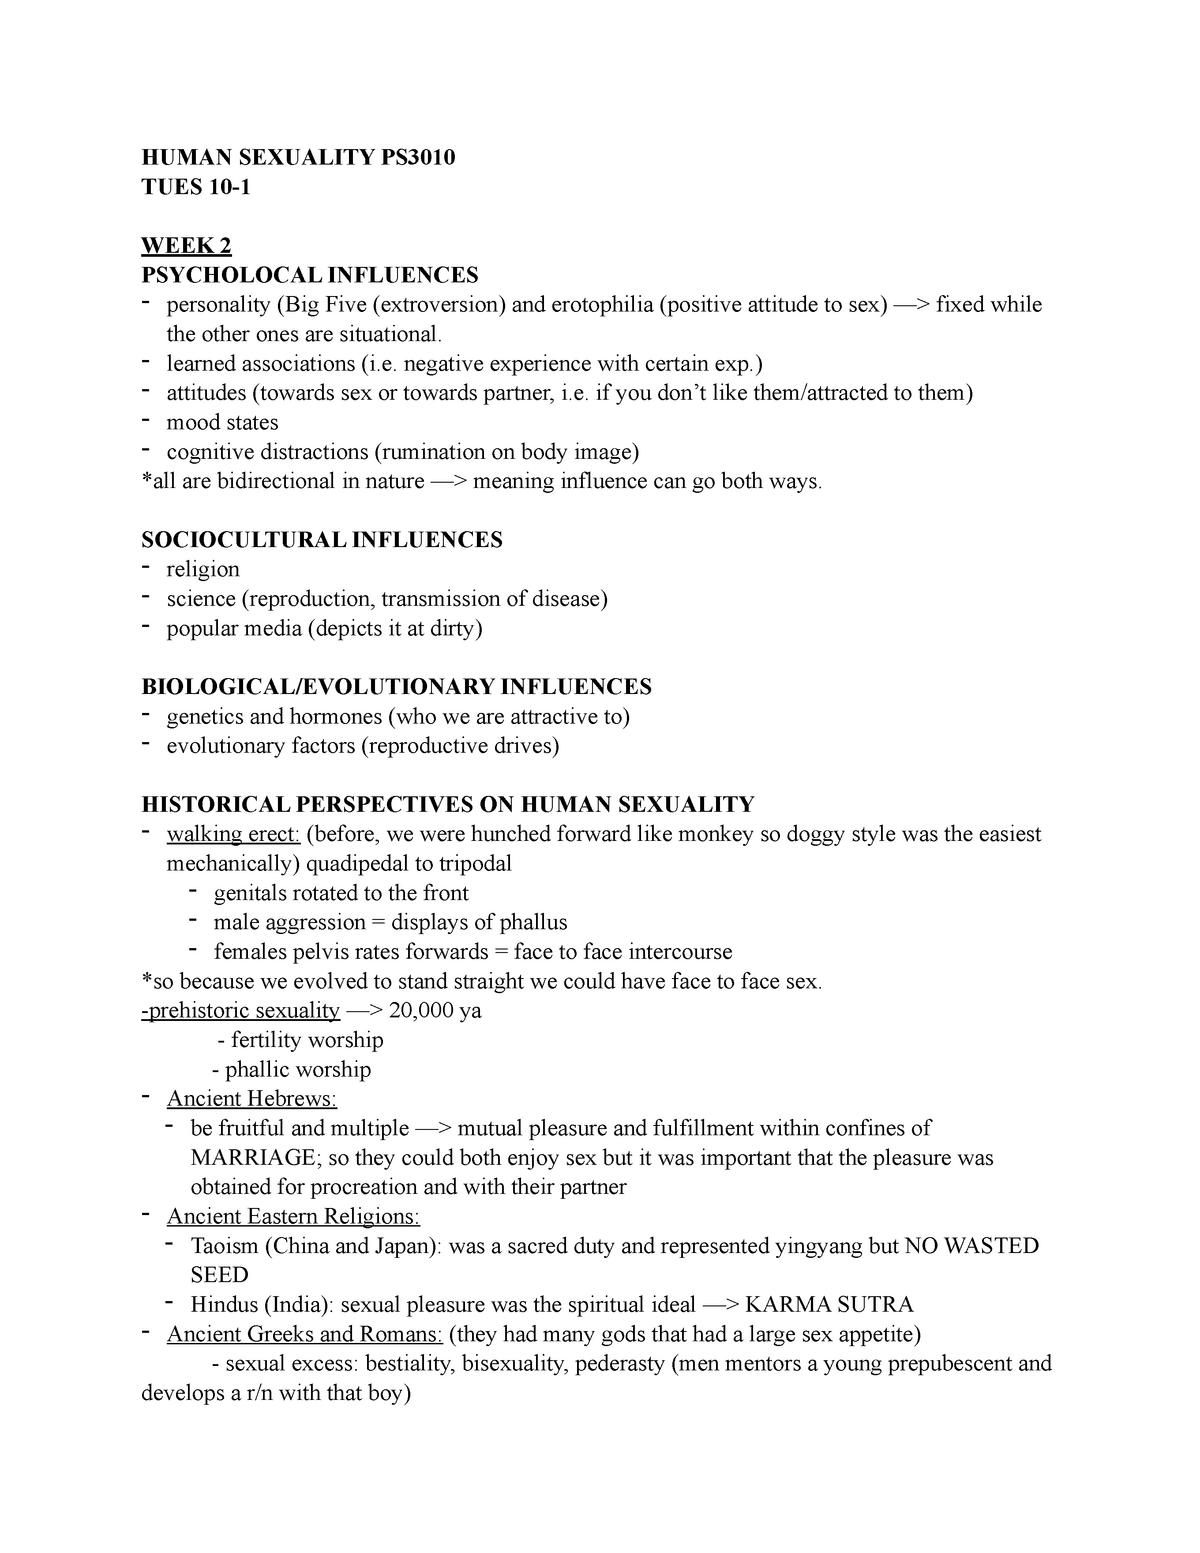 Human Sexuality Notes PDF - PSYC 3010: Human Sexuality - StuDocu